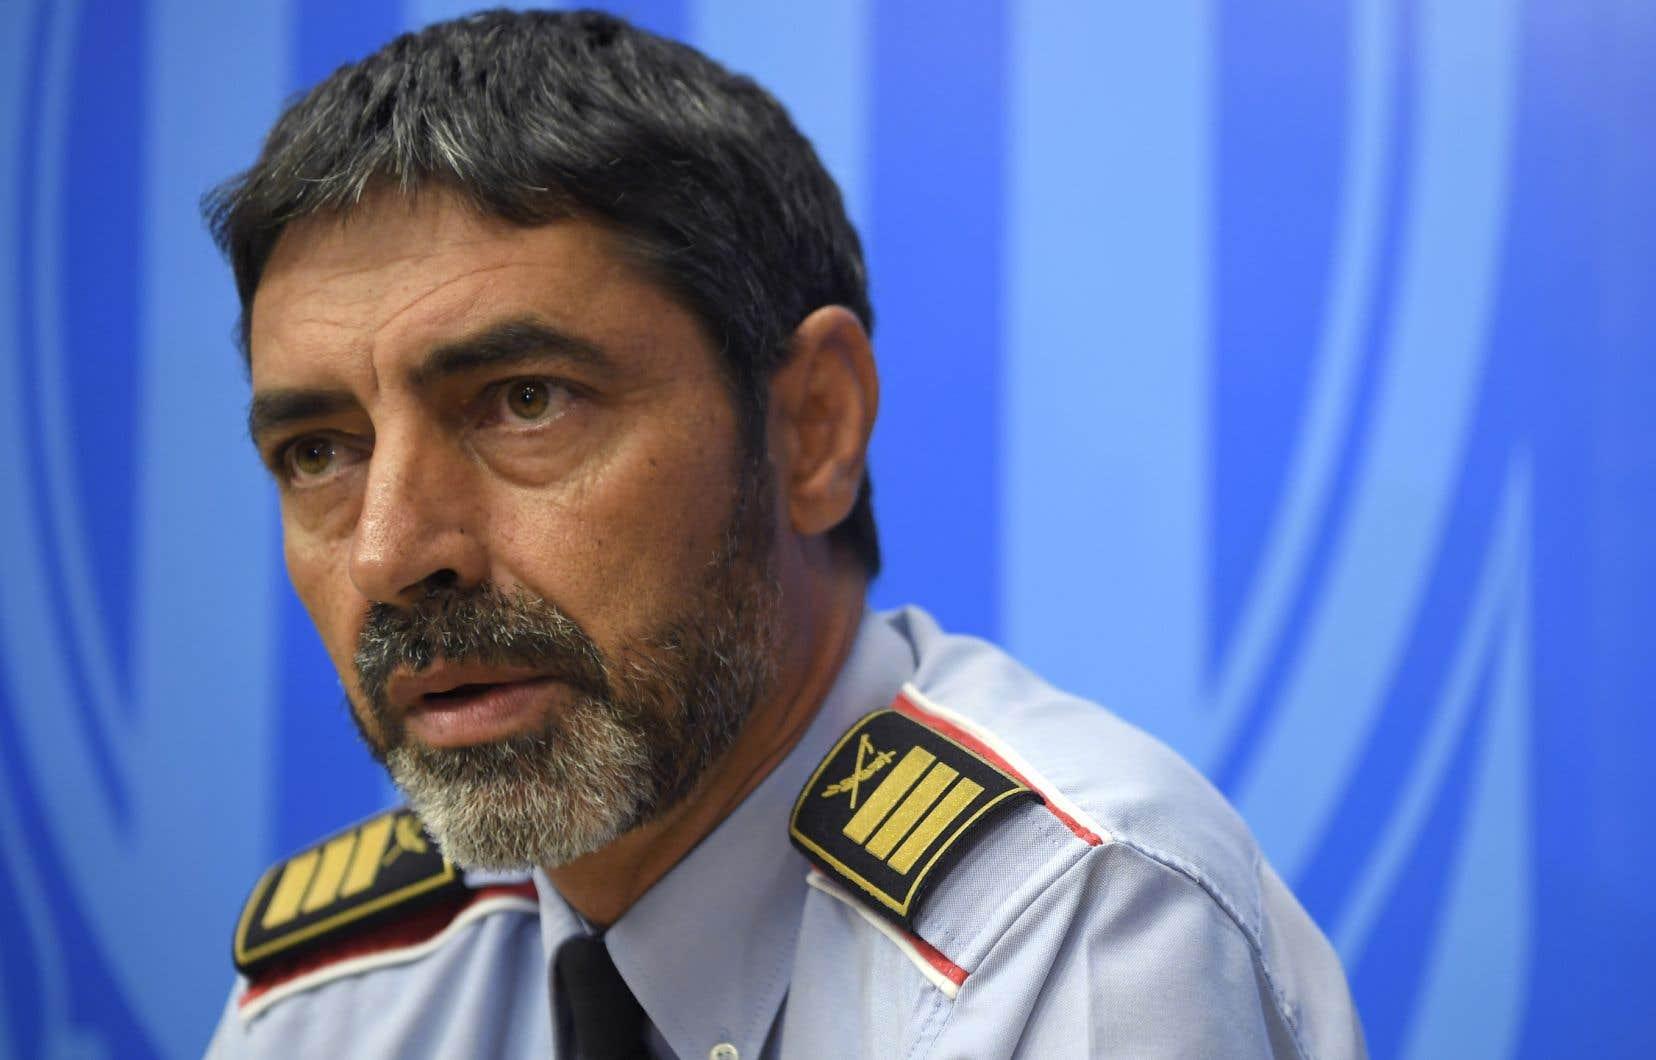 Josep Lluis Trapero, l'ancien chef des Mossos d'Esquadra, la police régionale catalane